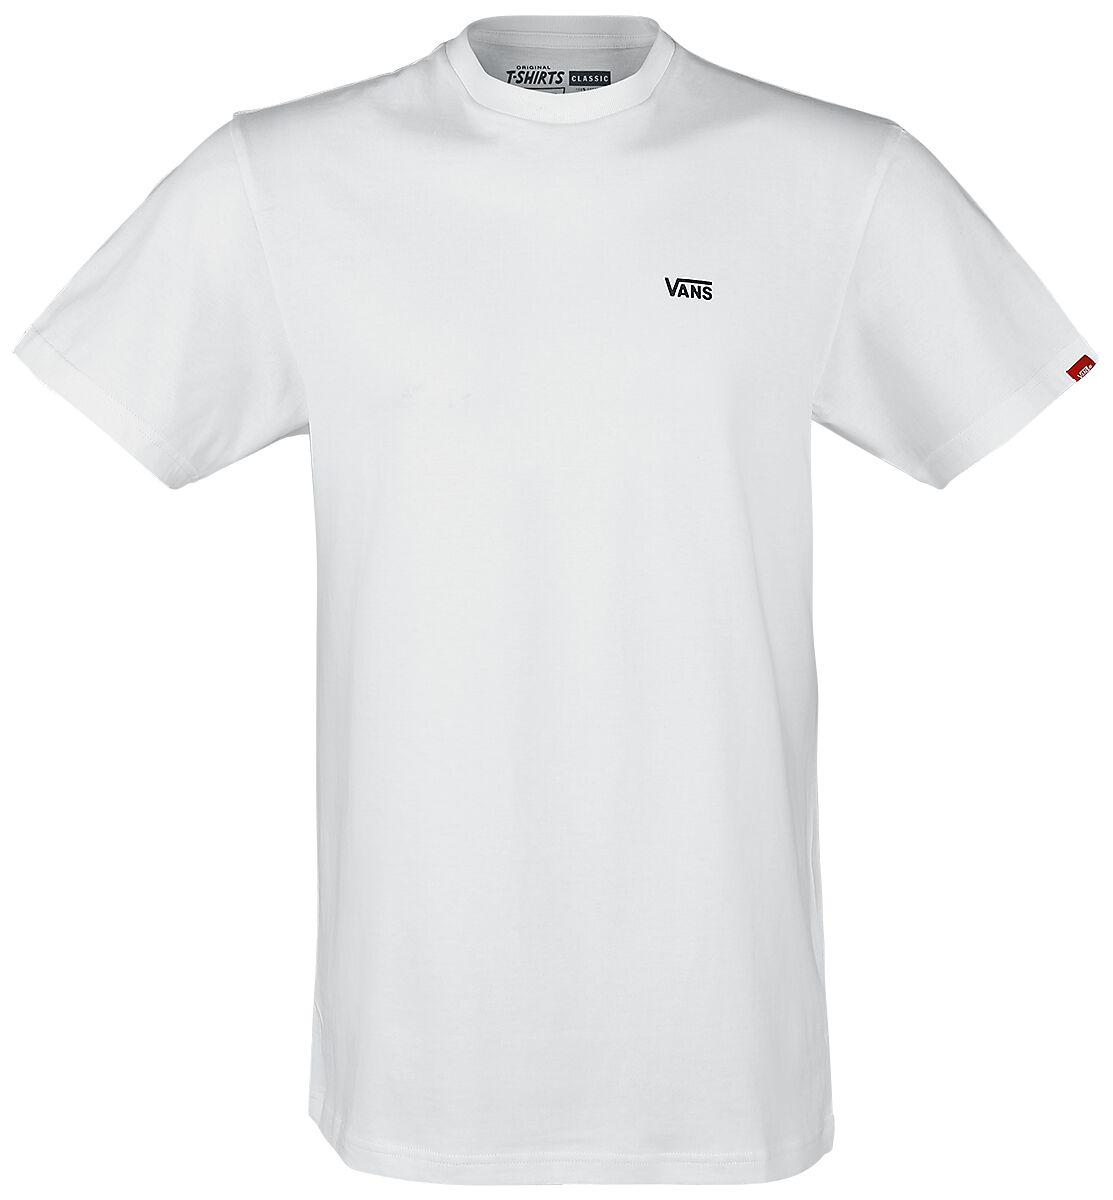 Image of   Vans Left Chest Logo Tee T-Shirt hvid